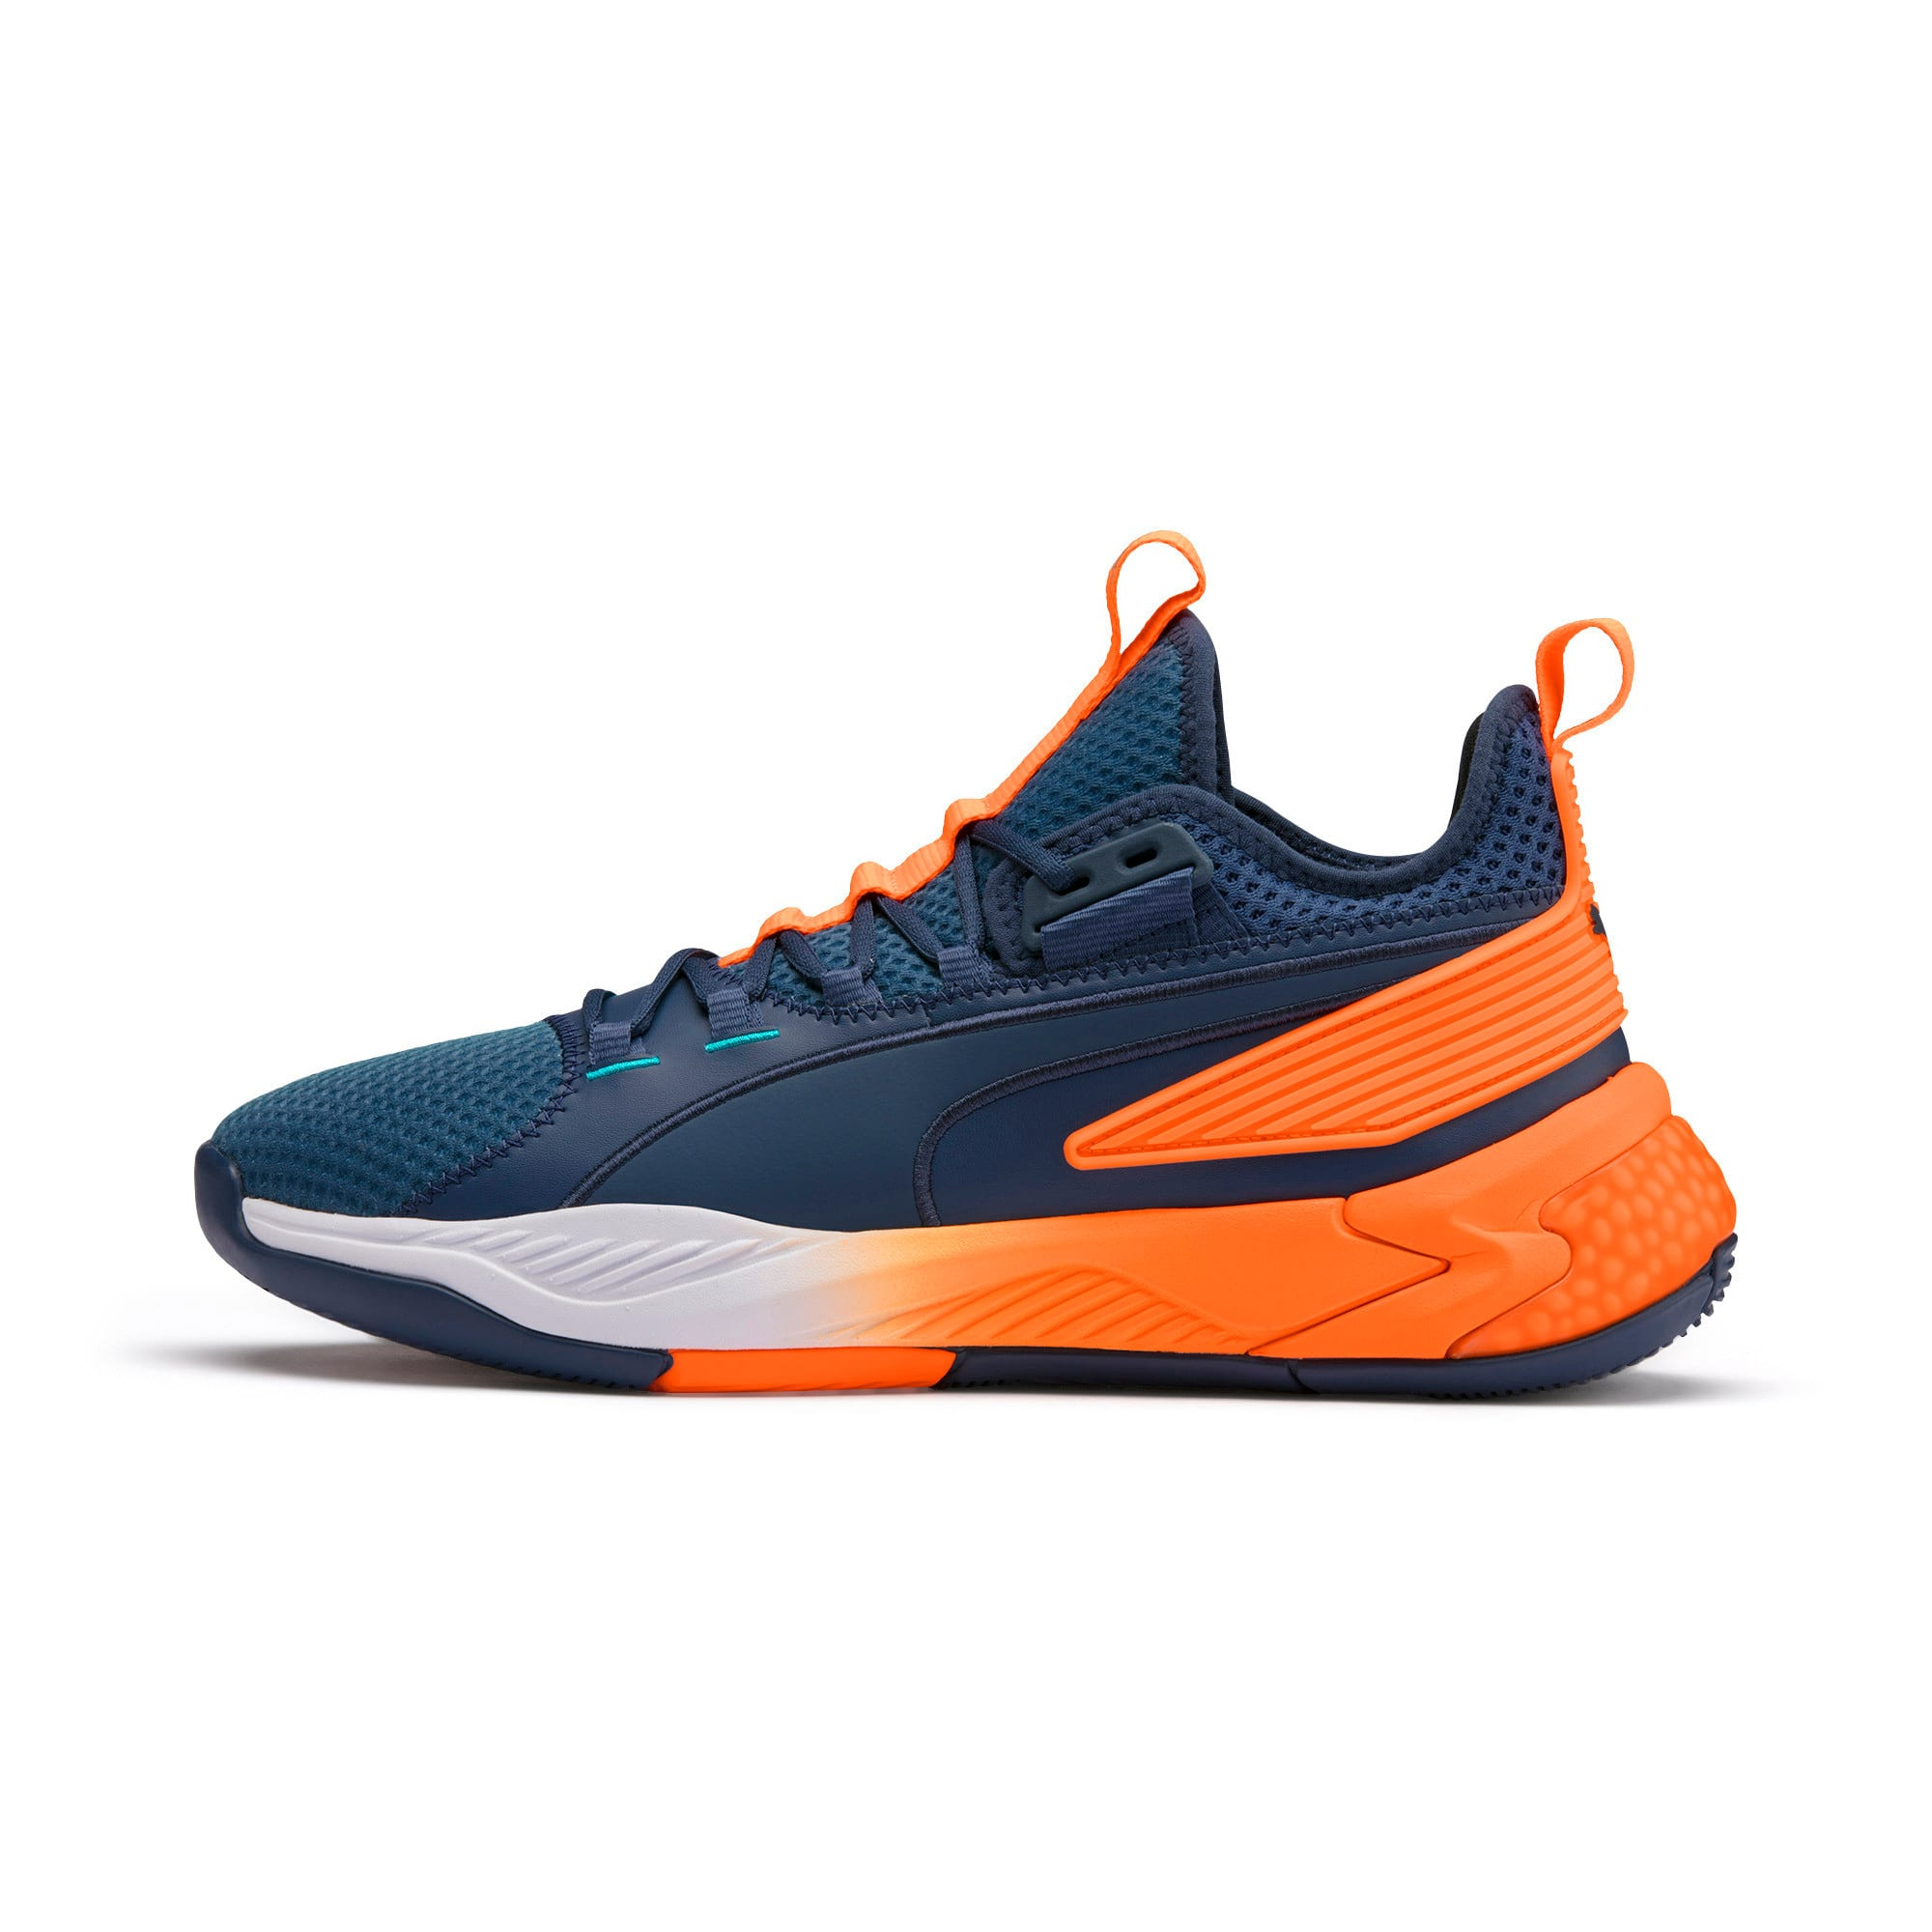 Thumbnail 1 of Uproar Charlotte ASG Fade Basketball Shoes, Orange- PURPLE, medium